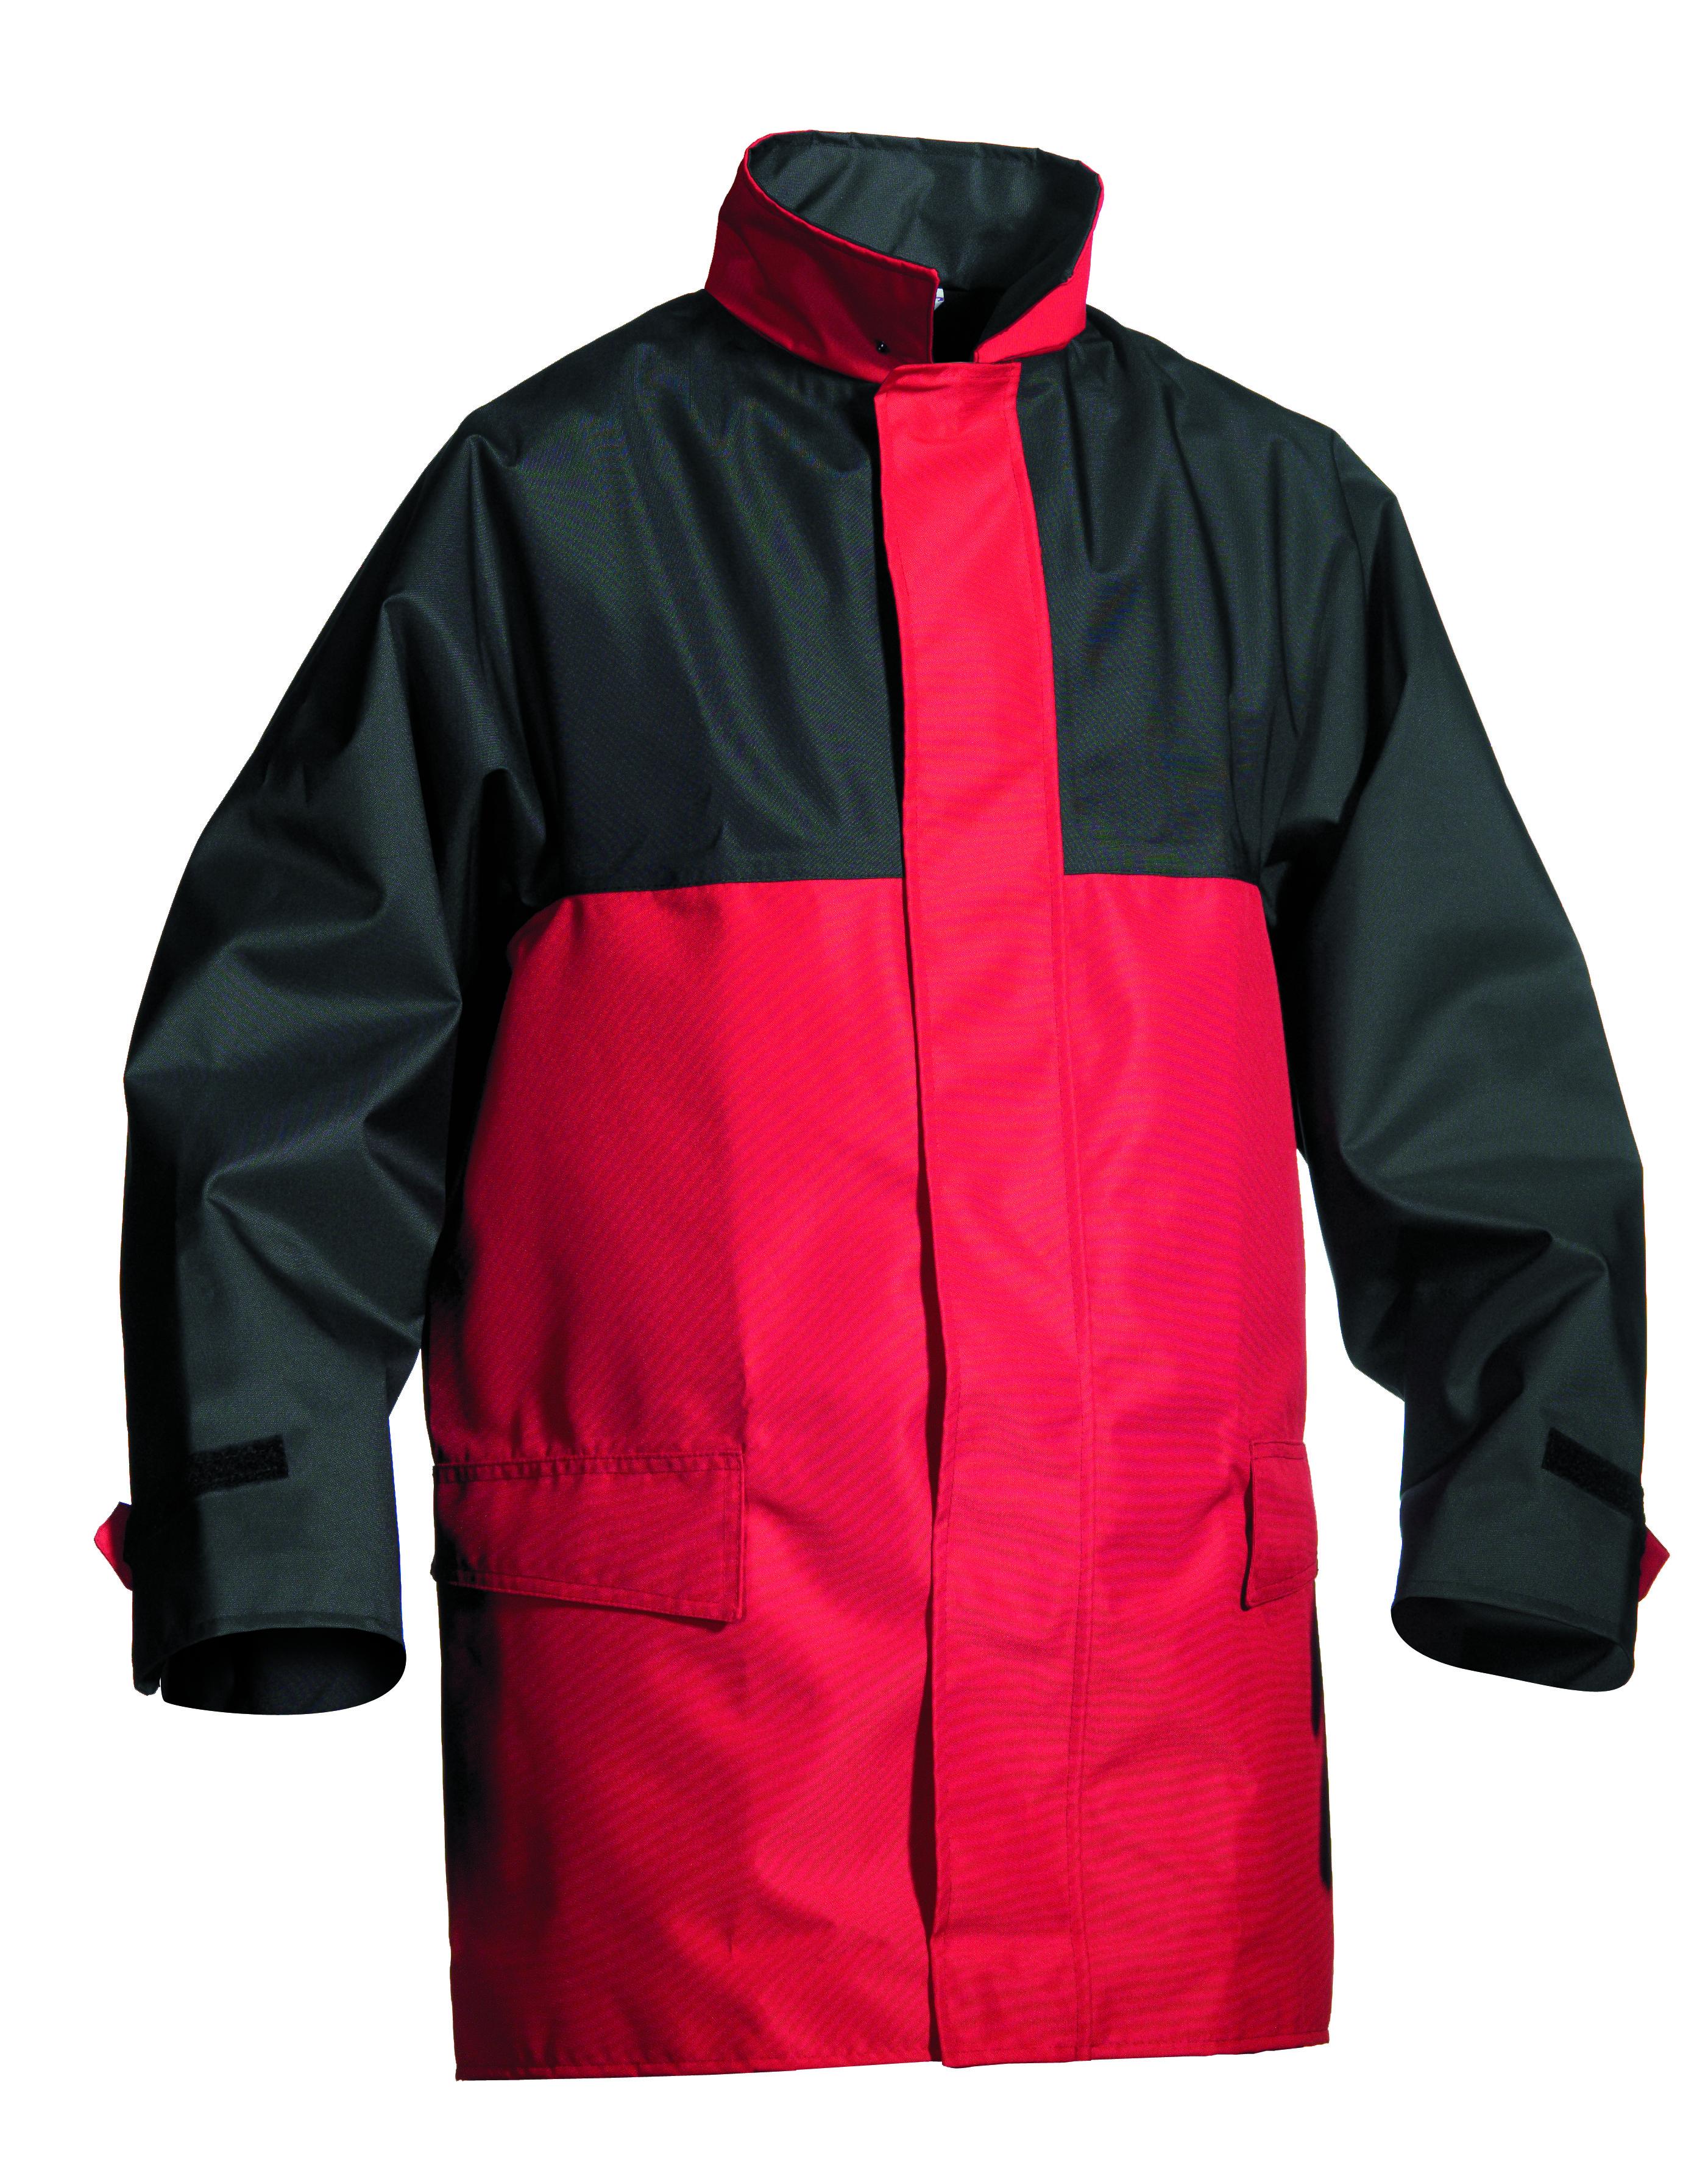 Regenjacke Wairotex 2-Färbig